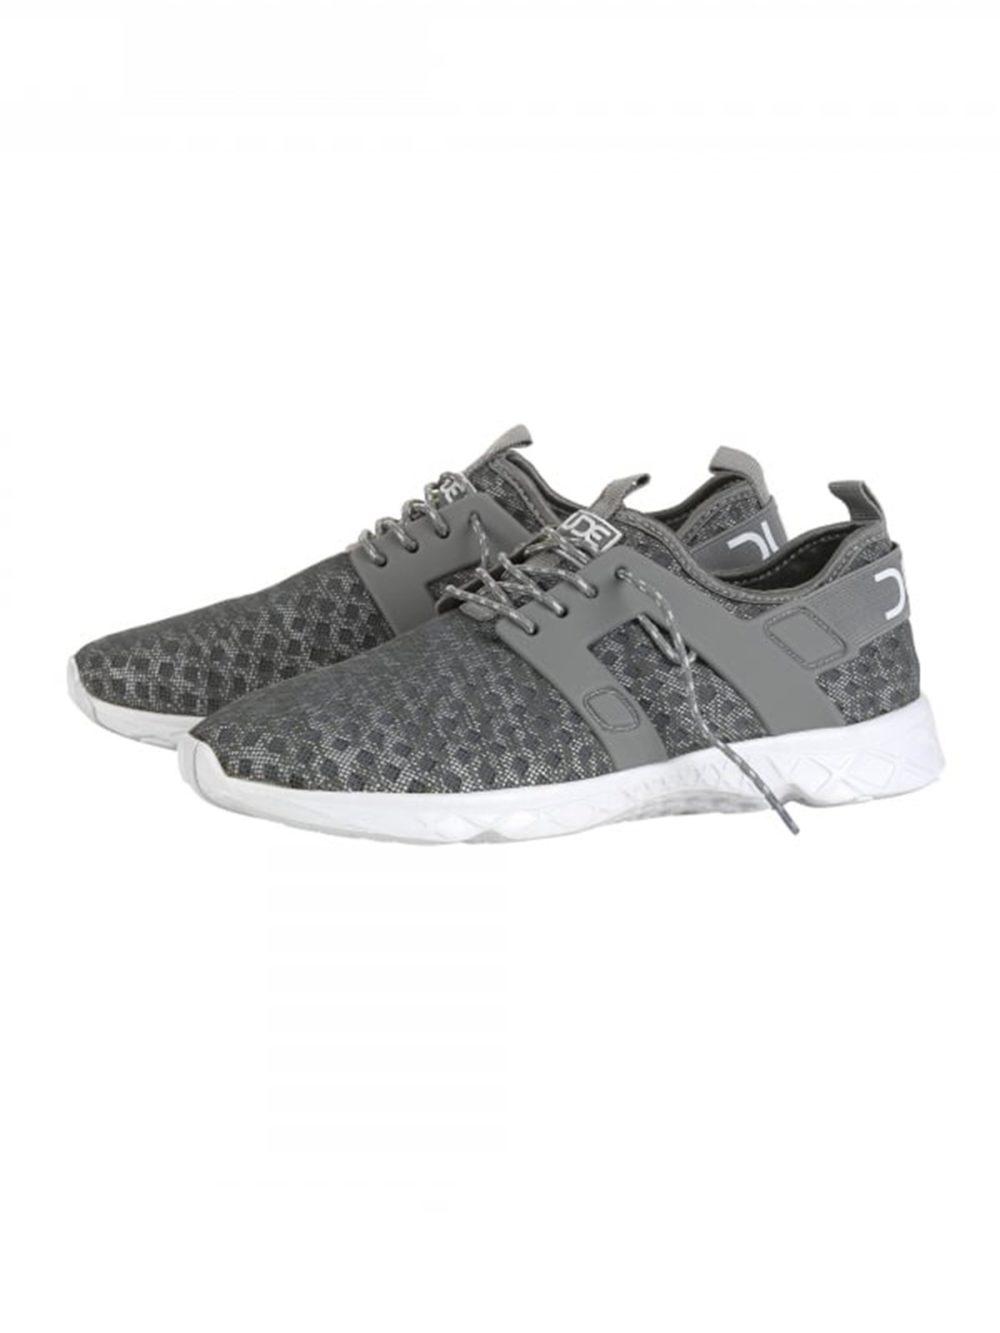 Mistral Grey Melange Airflow Hey Dude Shoes Katie Kerr Women's Clothing